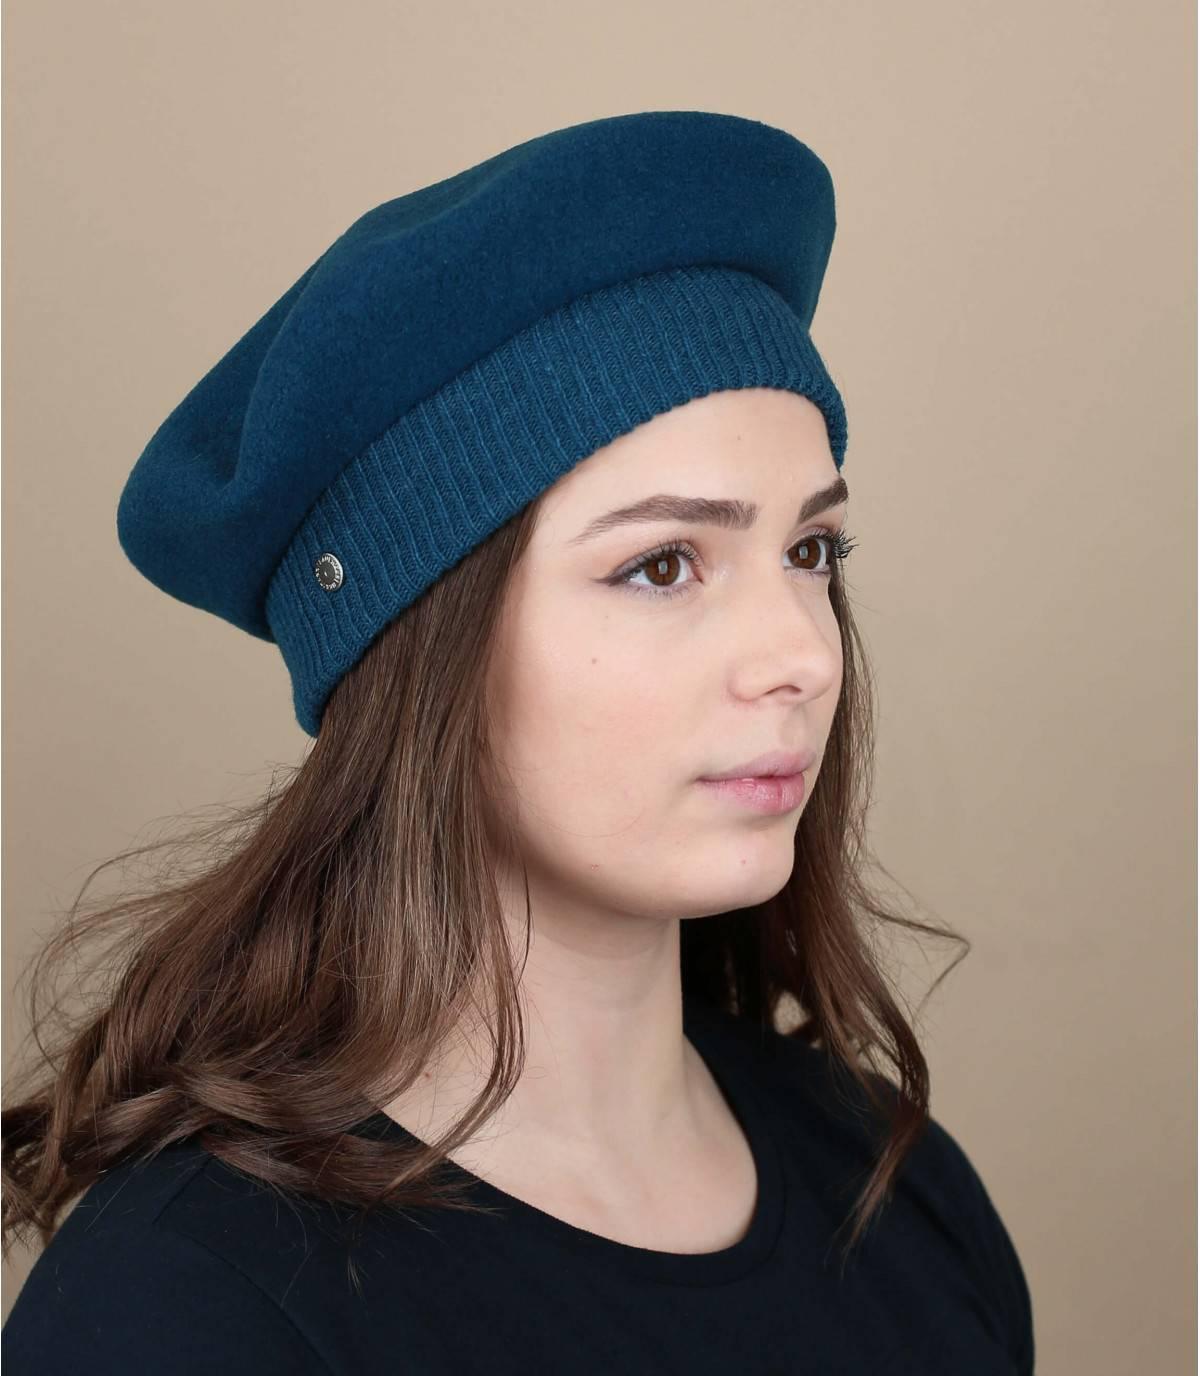 Baskenmütze Laulhère blau